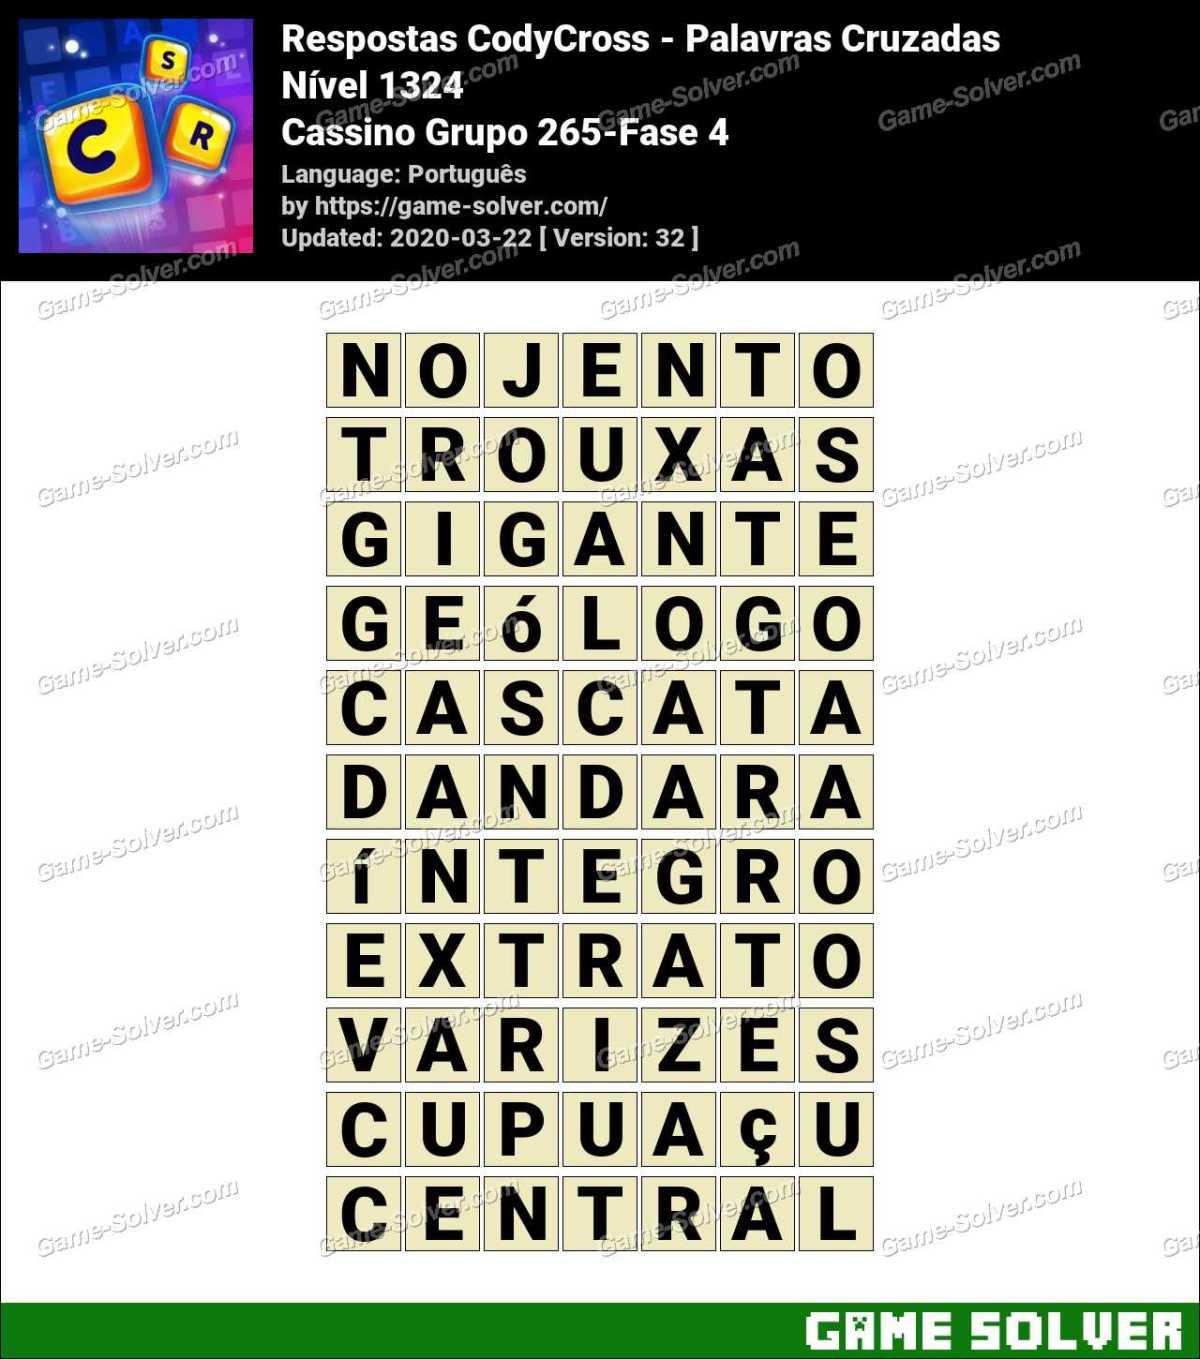 Respostas CodyCross Cassino Grupo 265-Fase 4